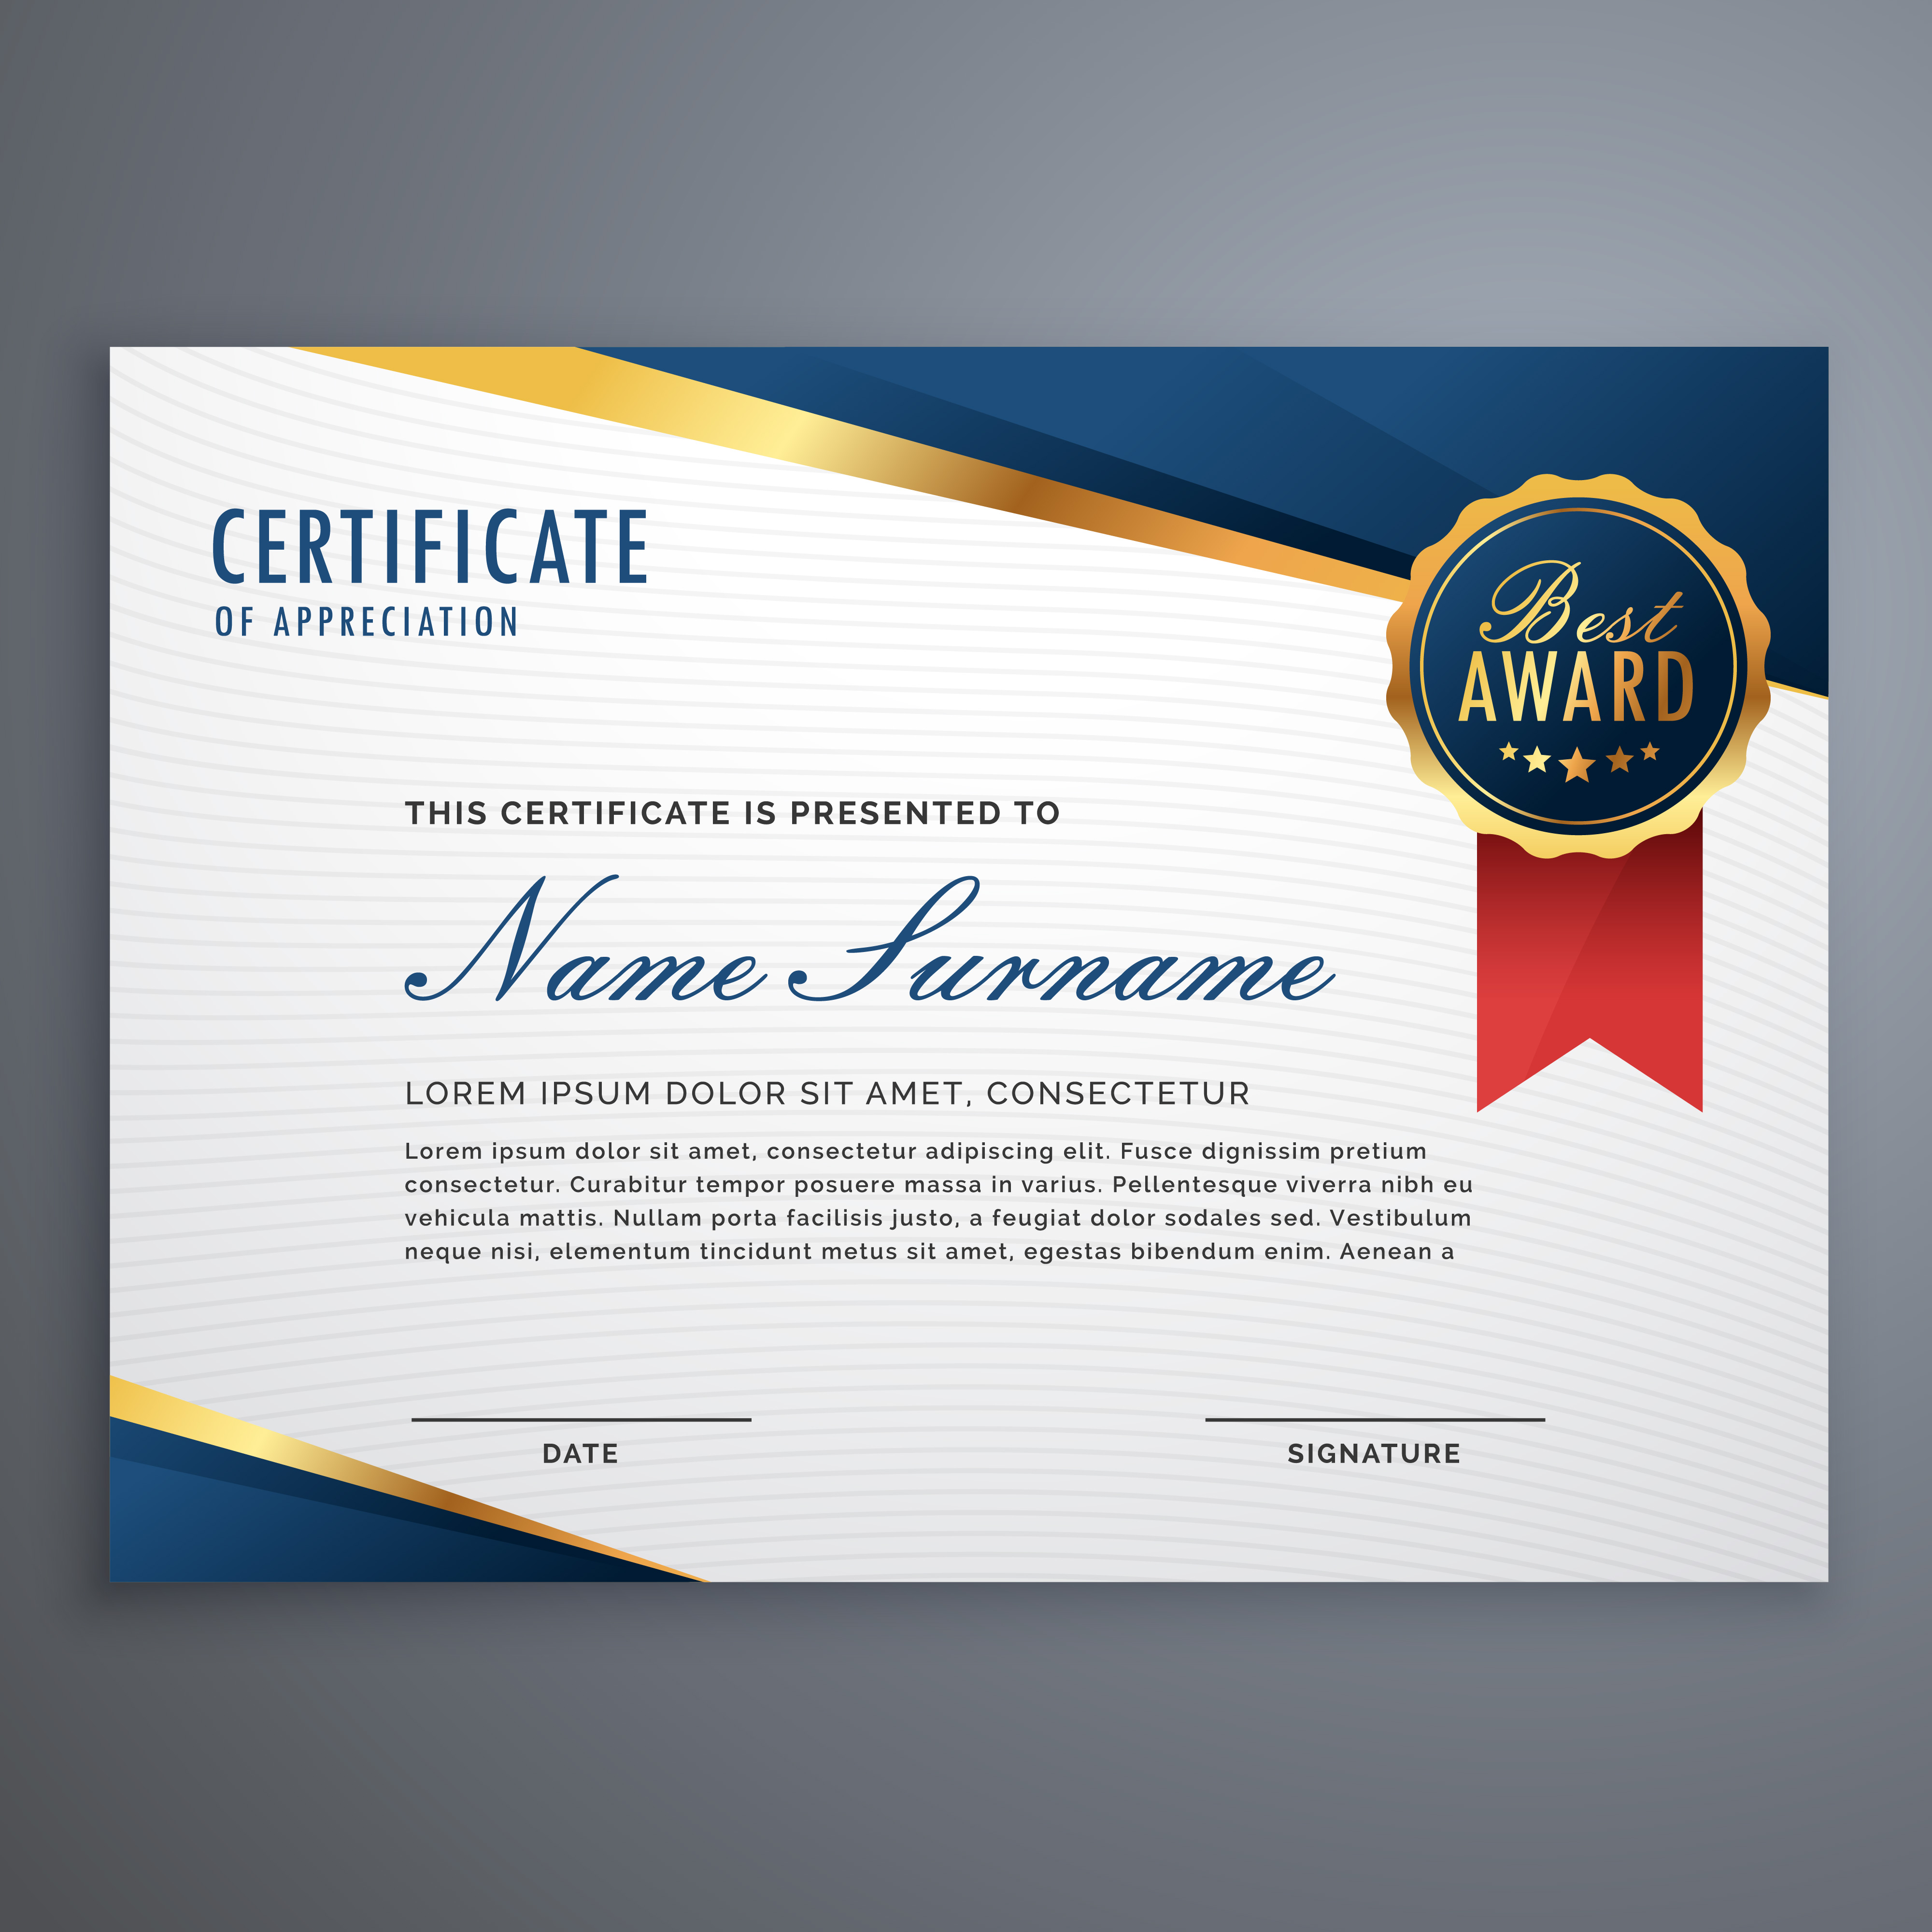 Creative Certificate Of Appreciation Award Template With